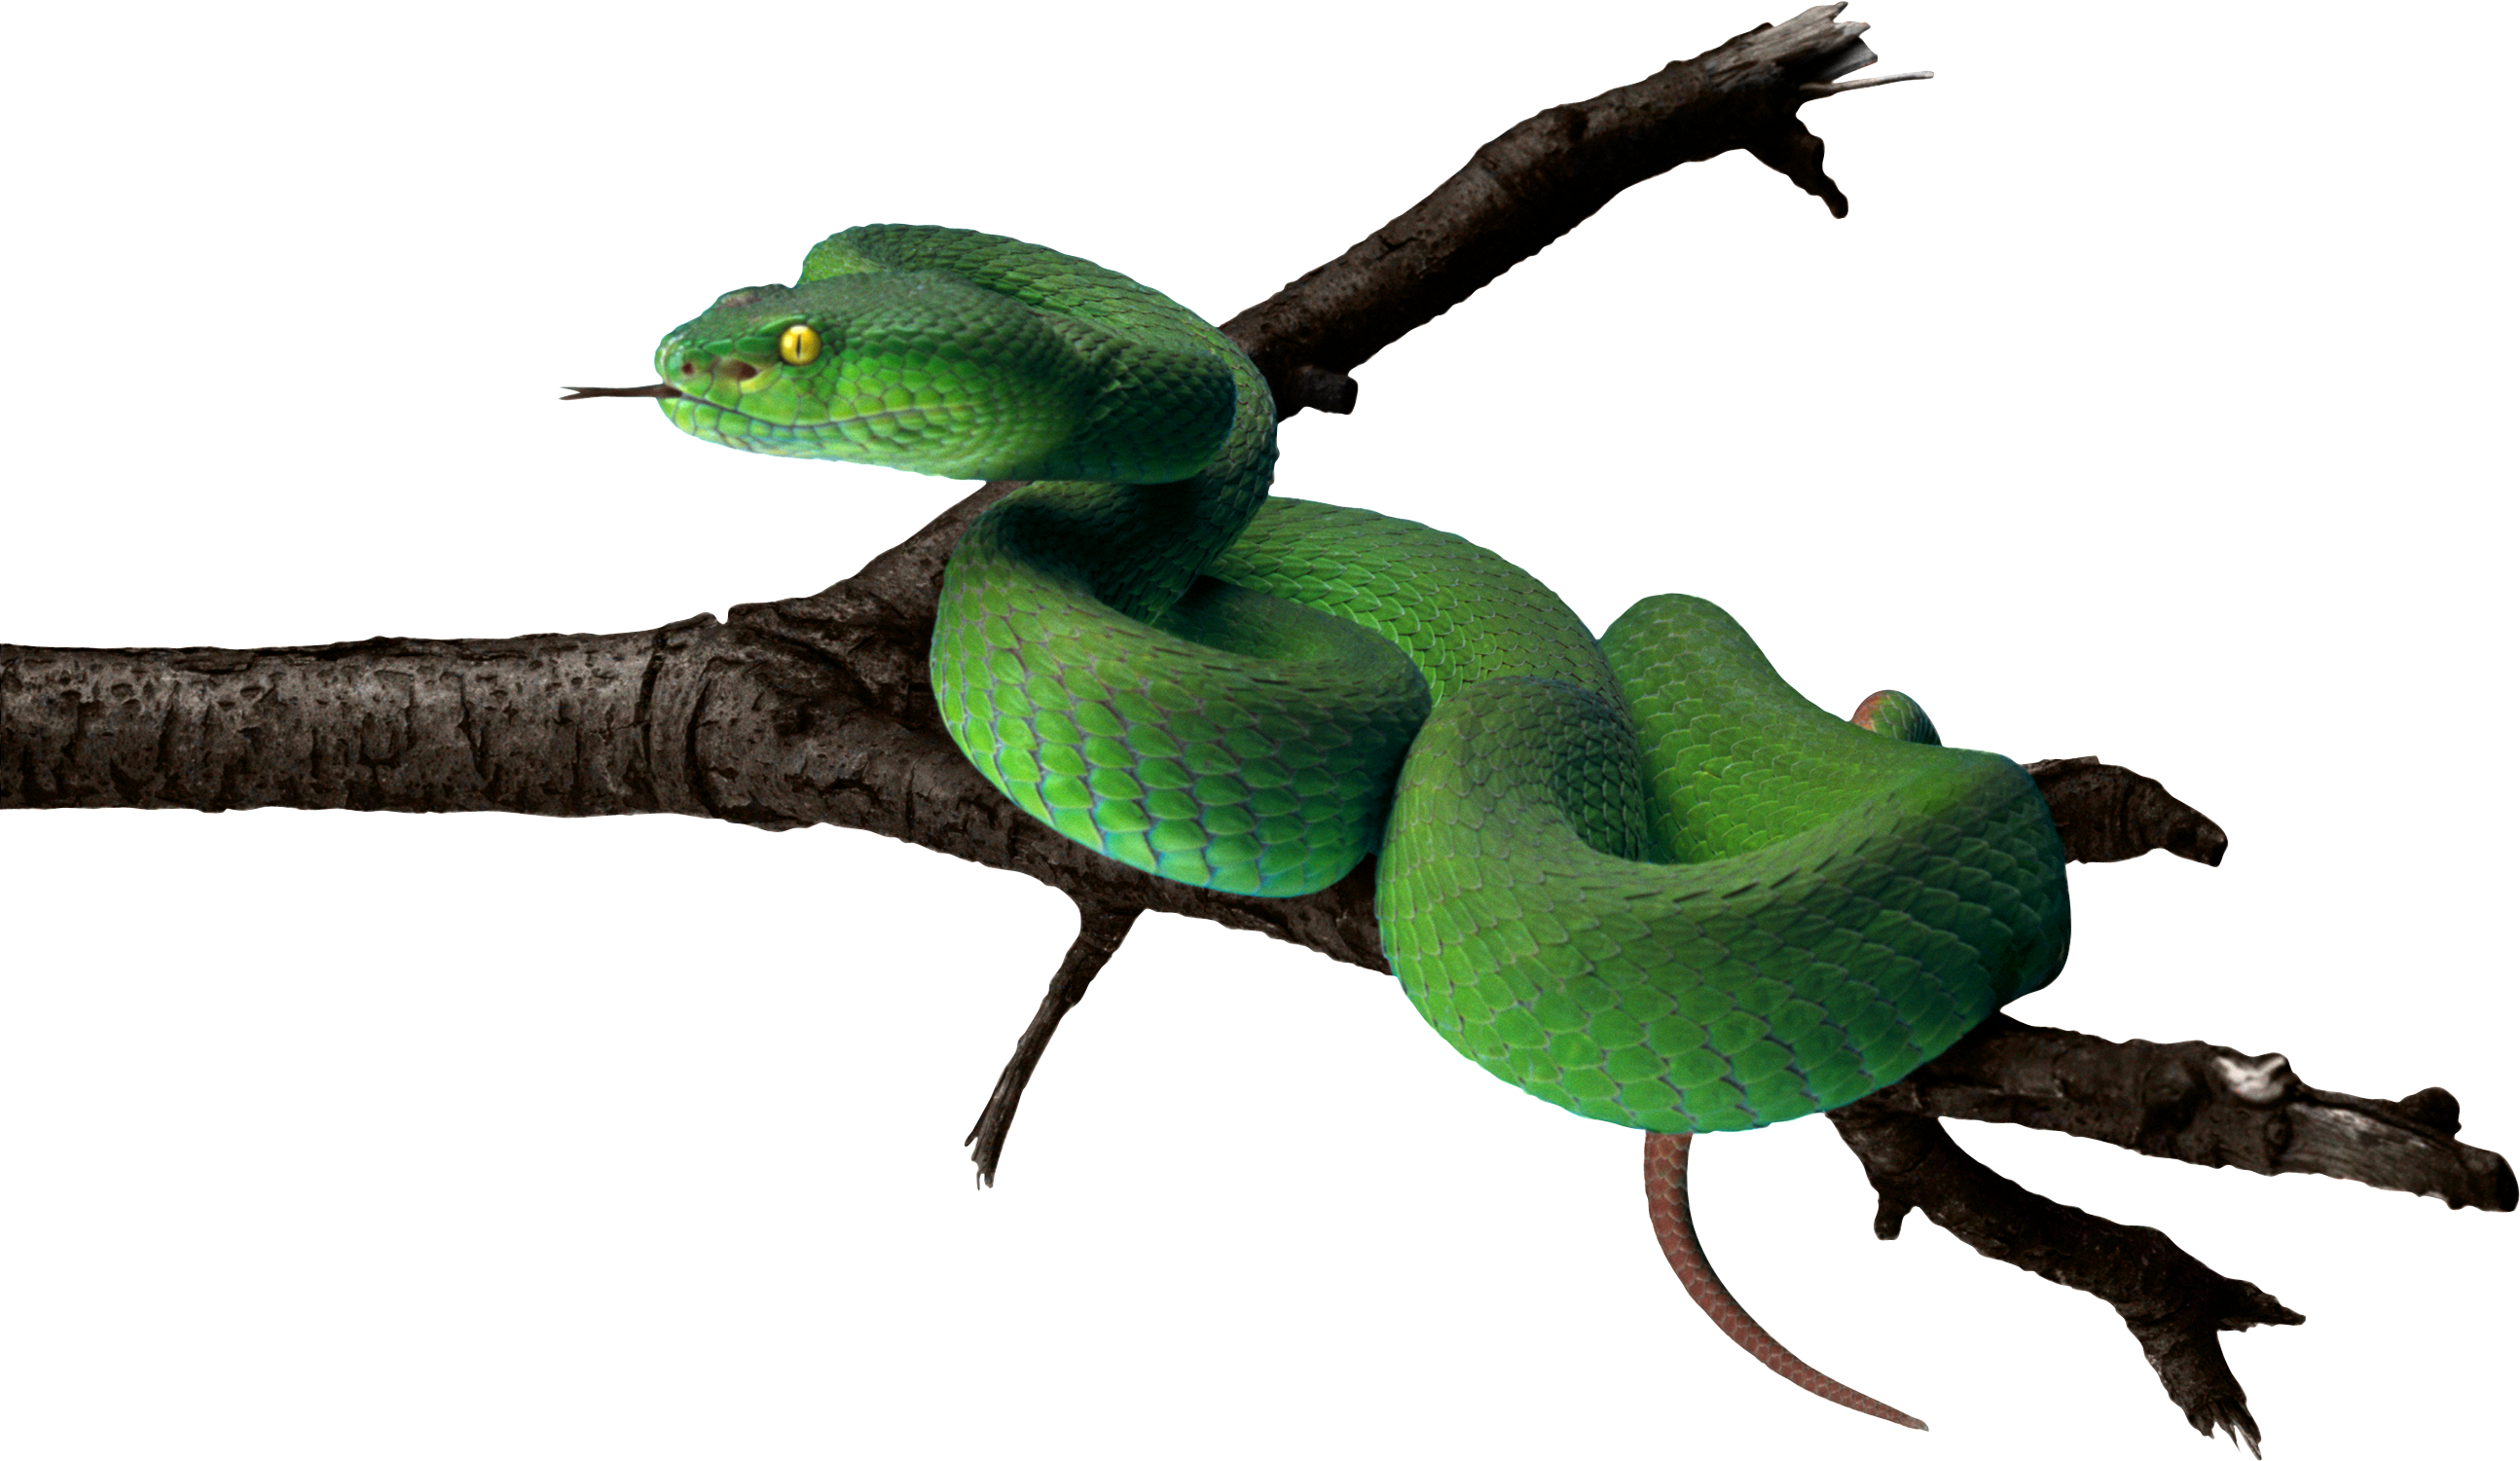 Download Png Image Green Snake Png Image